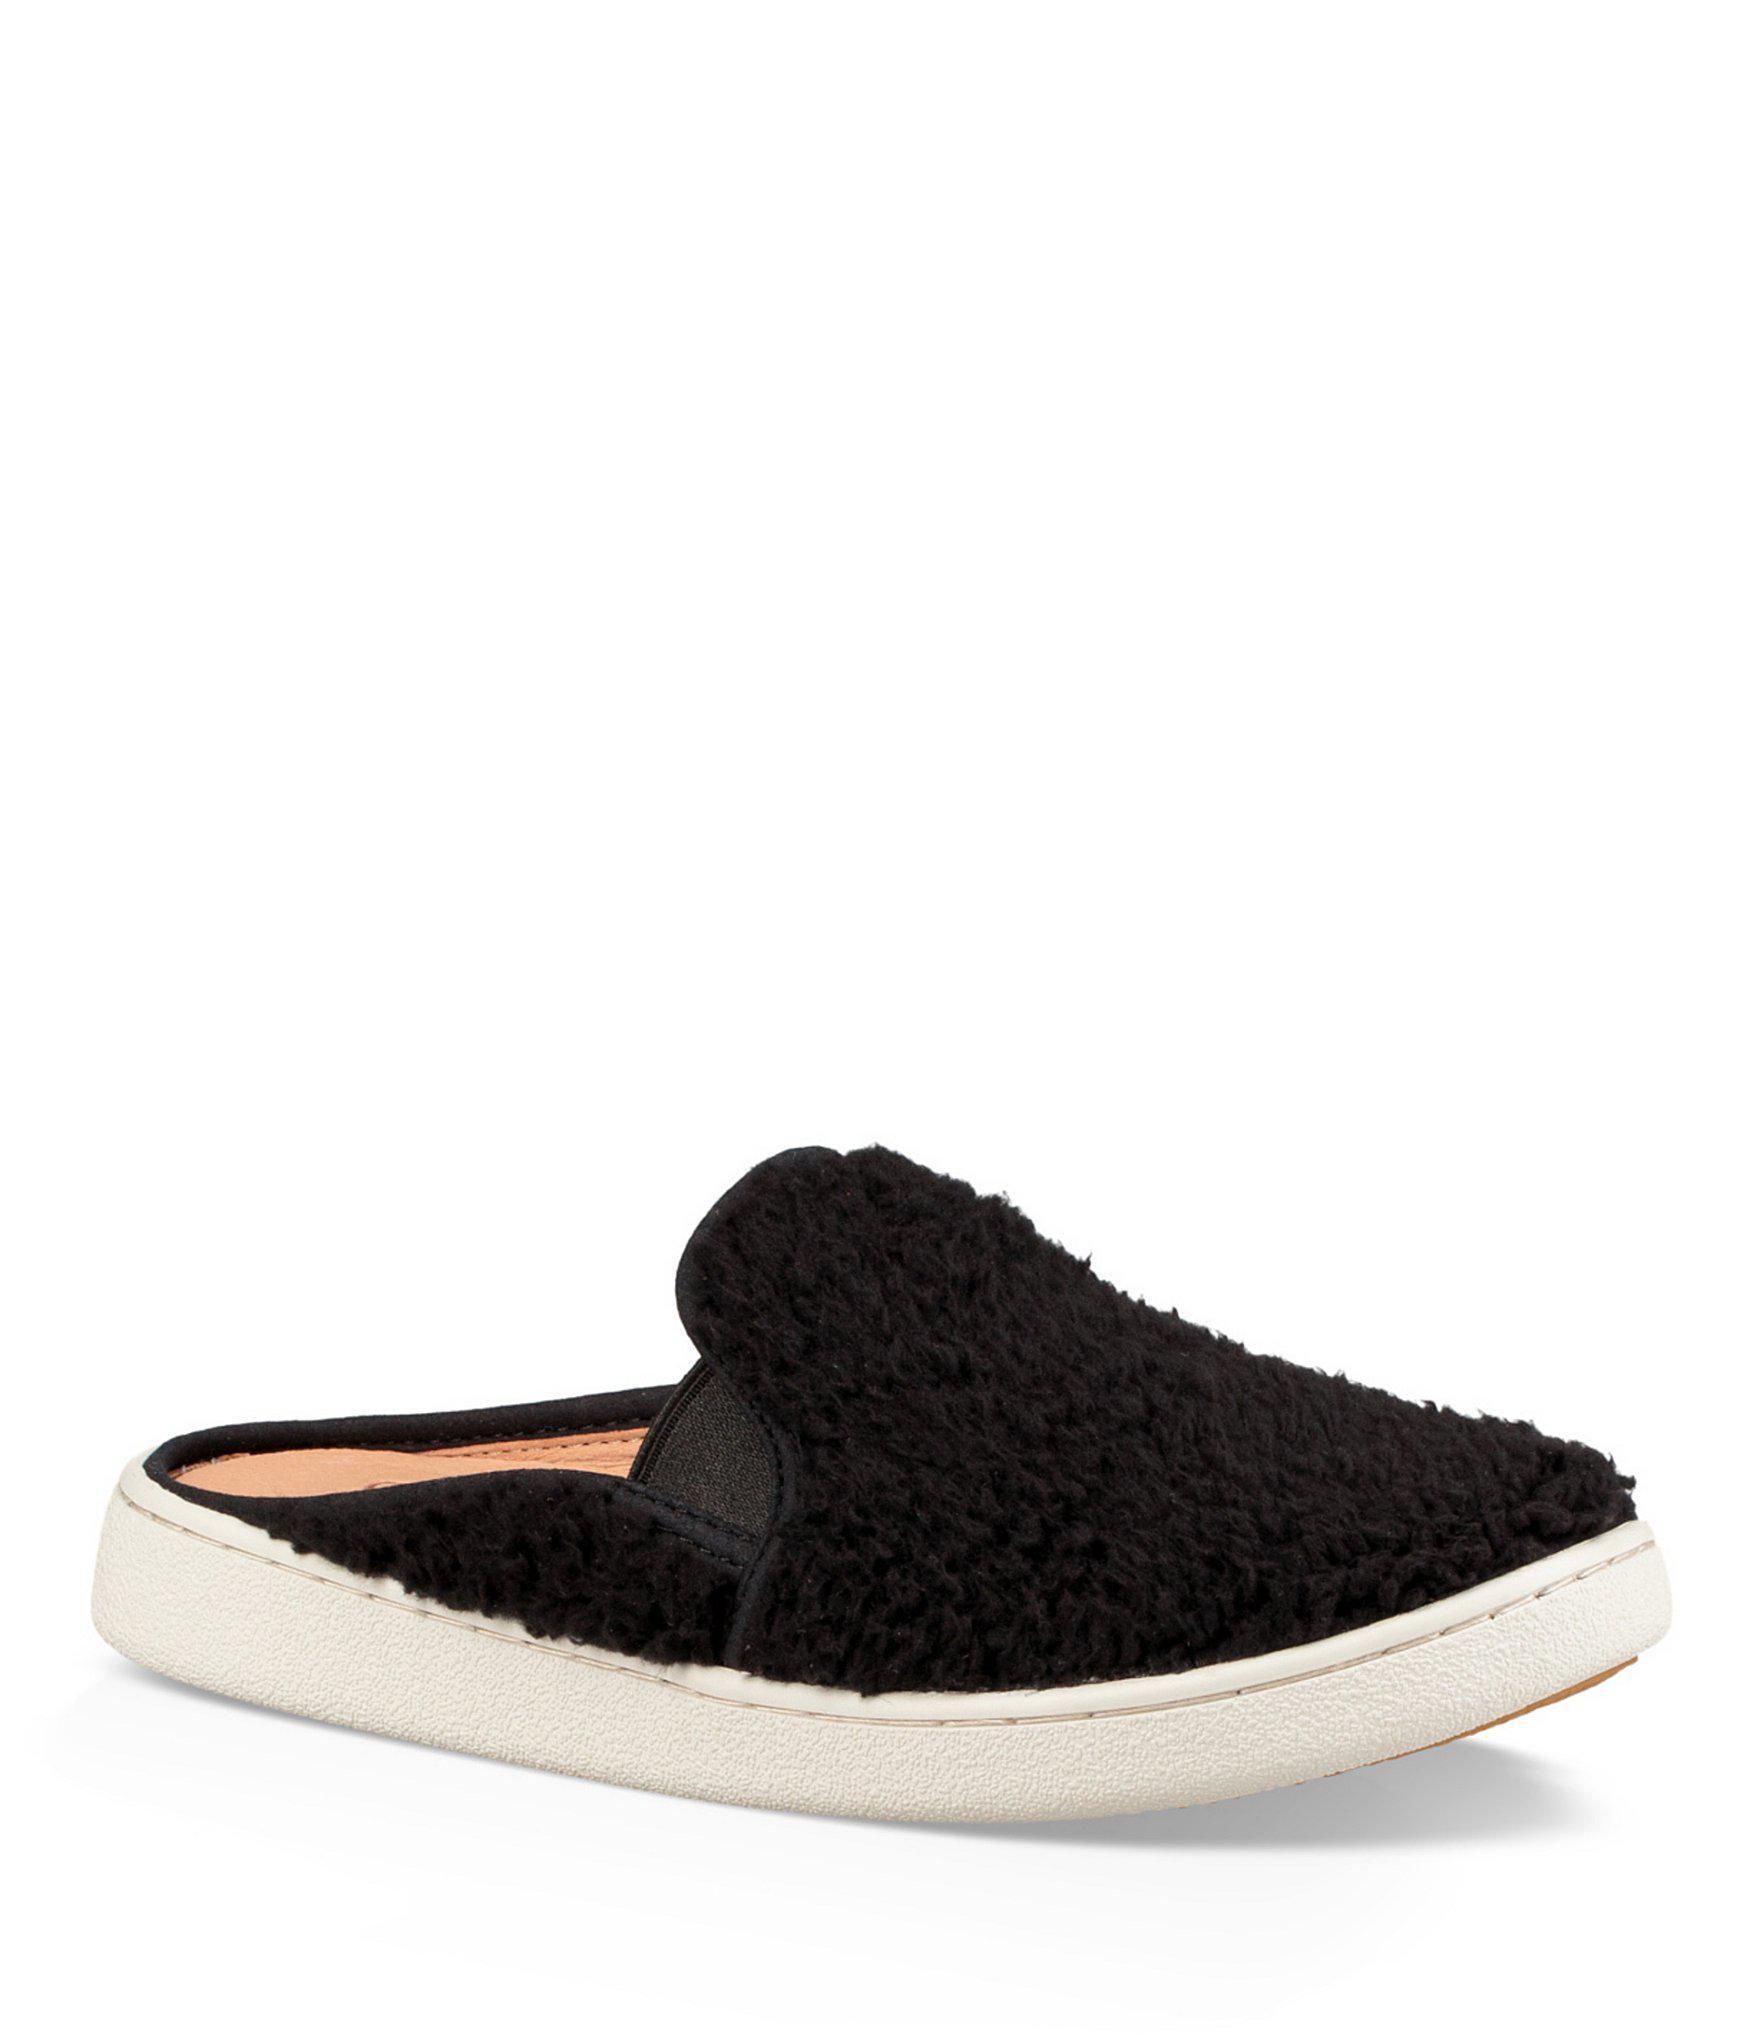 ugg mules black